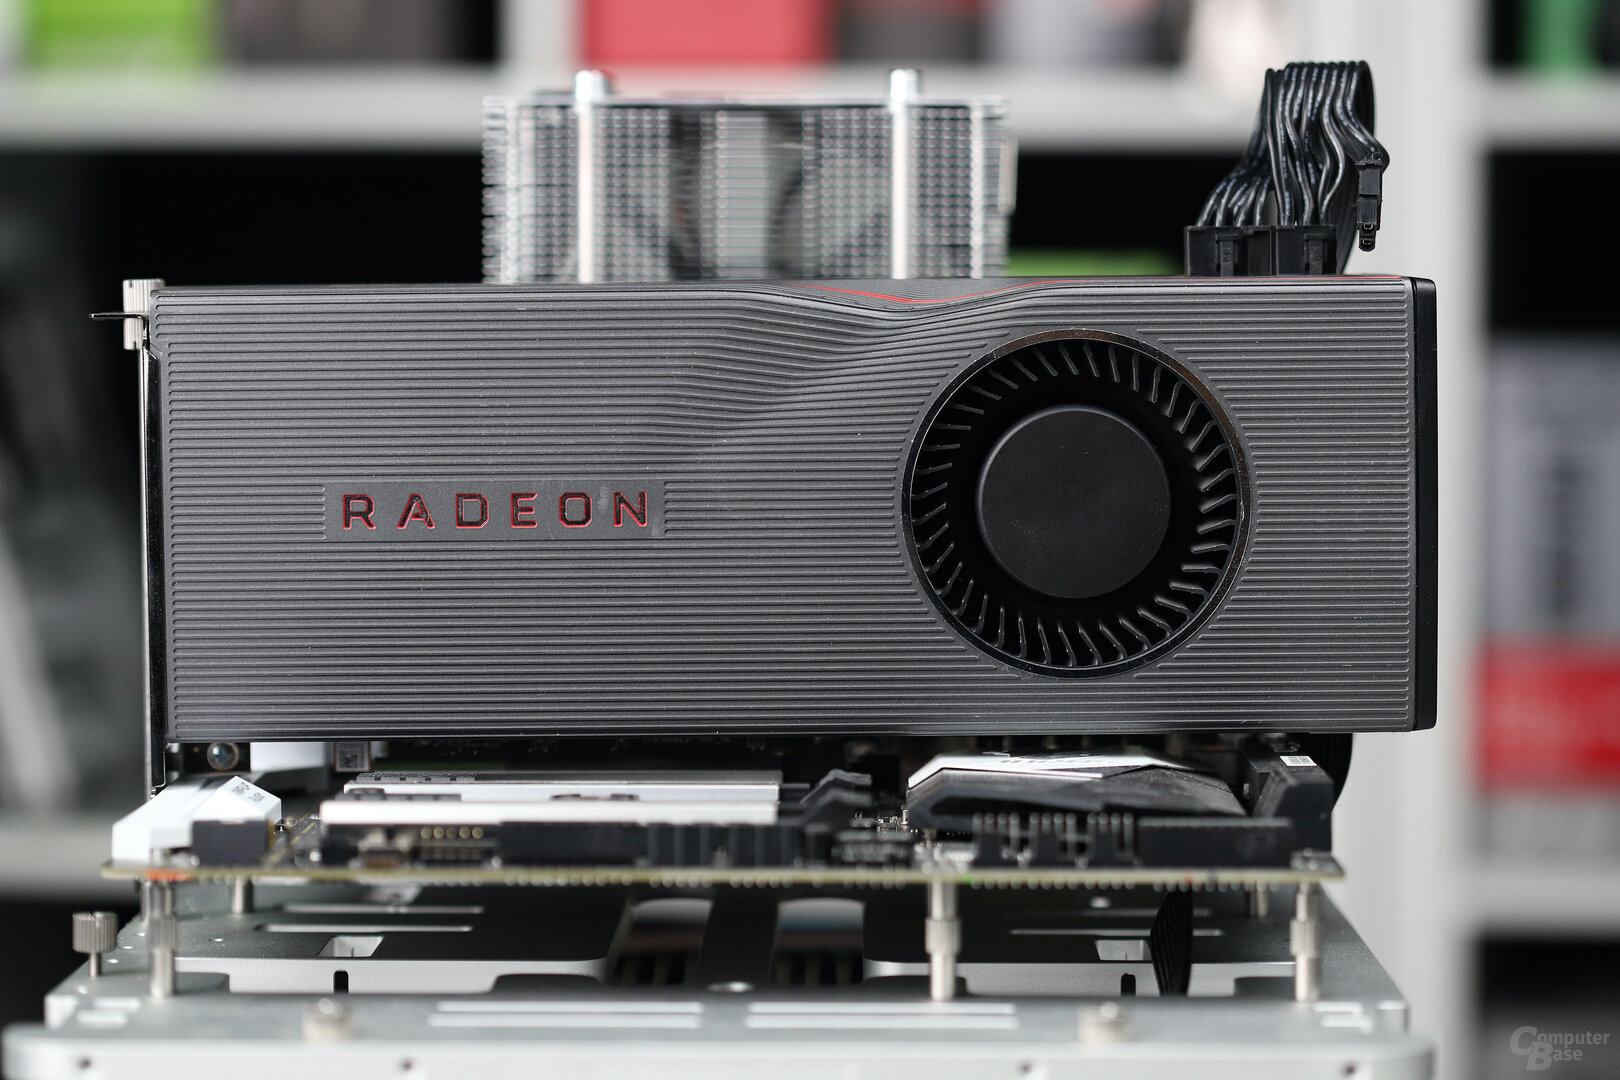 Form AMD Radeon RX 5700 XT